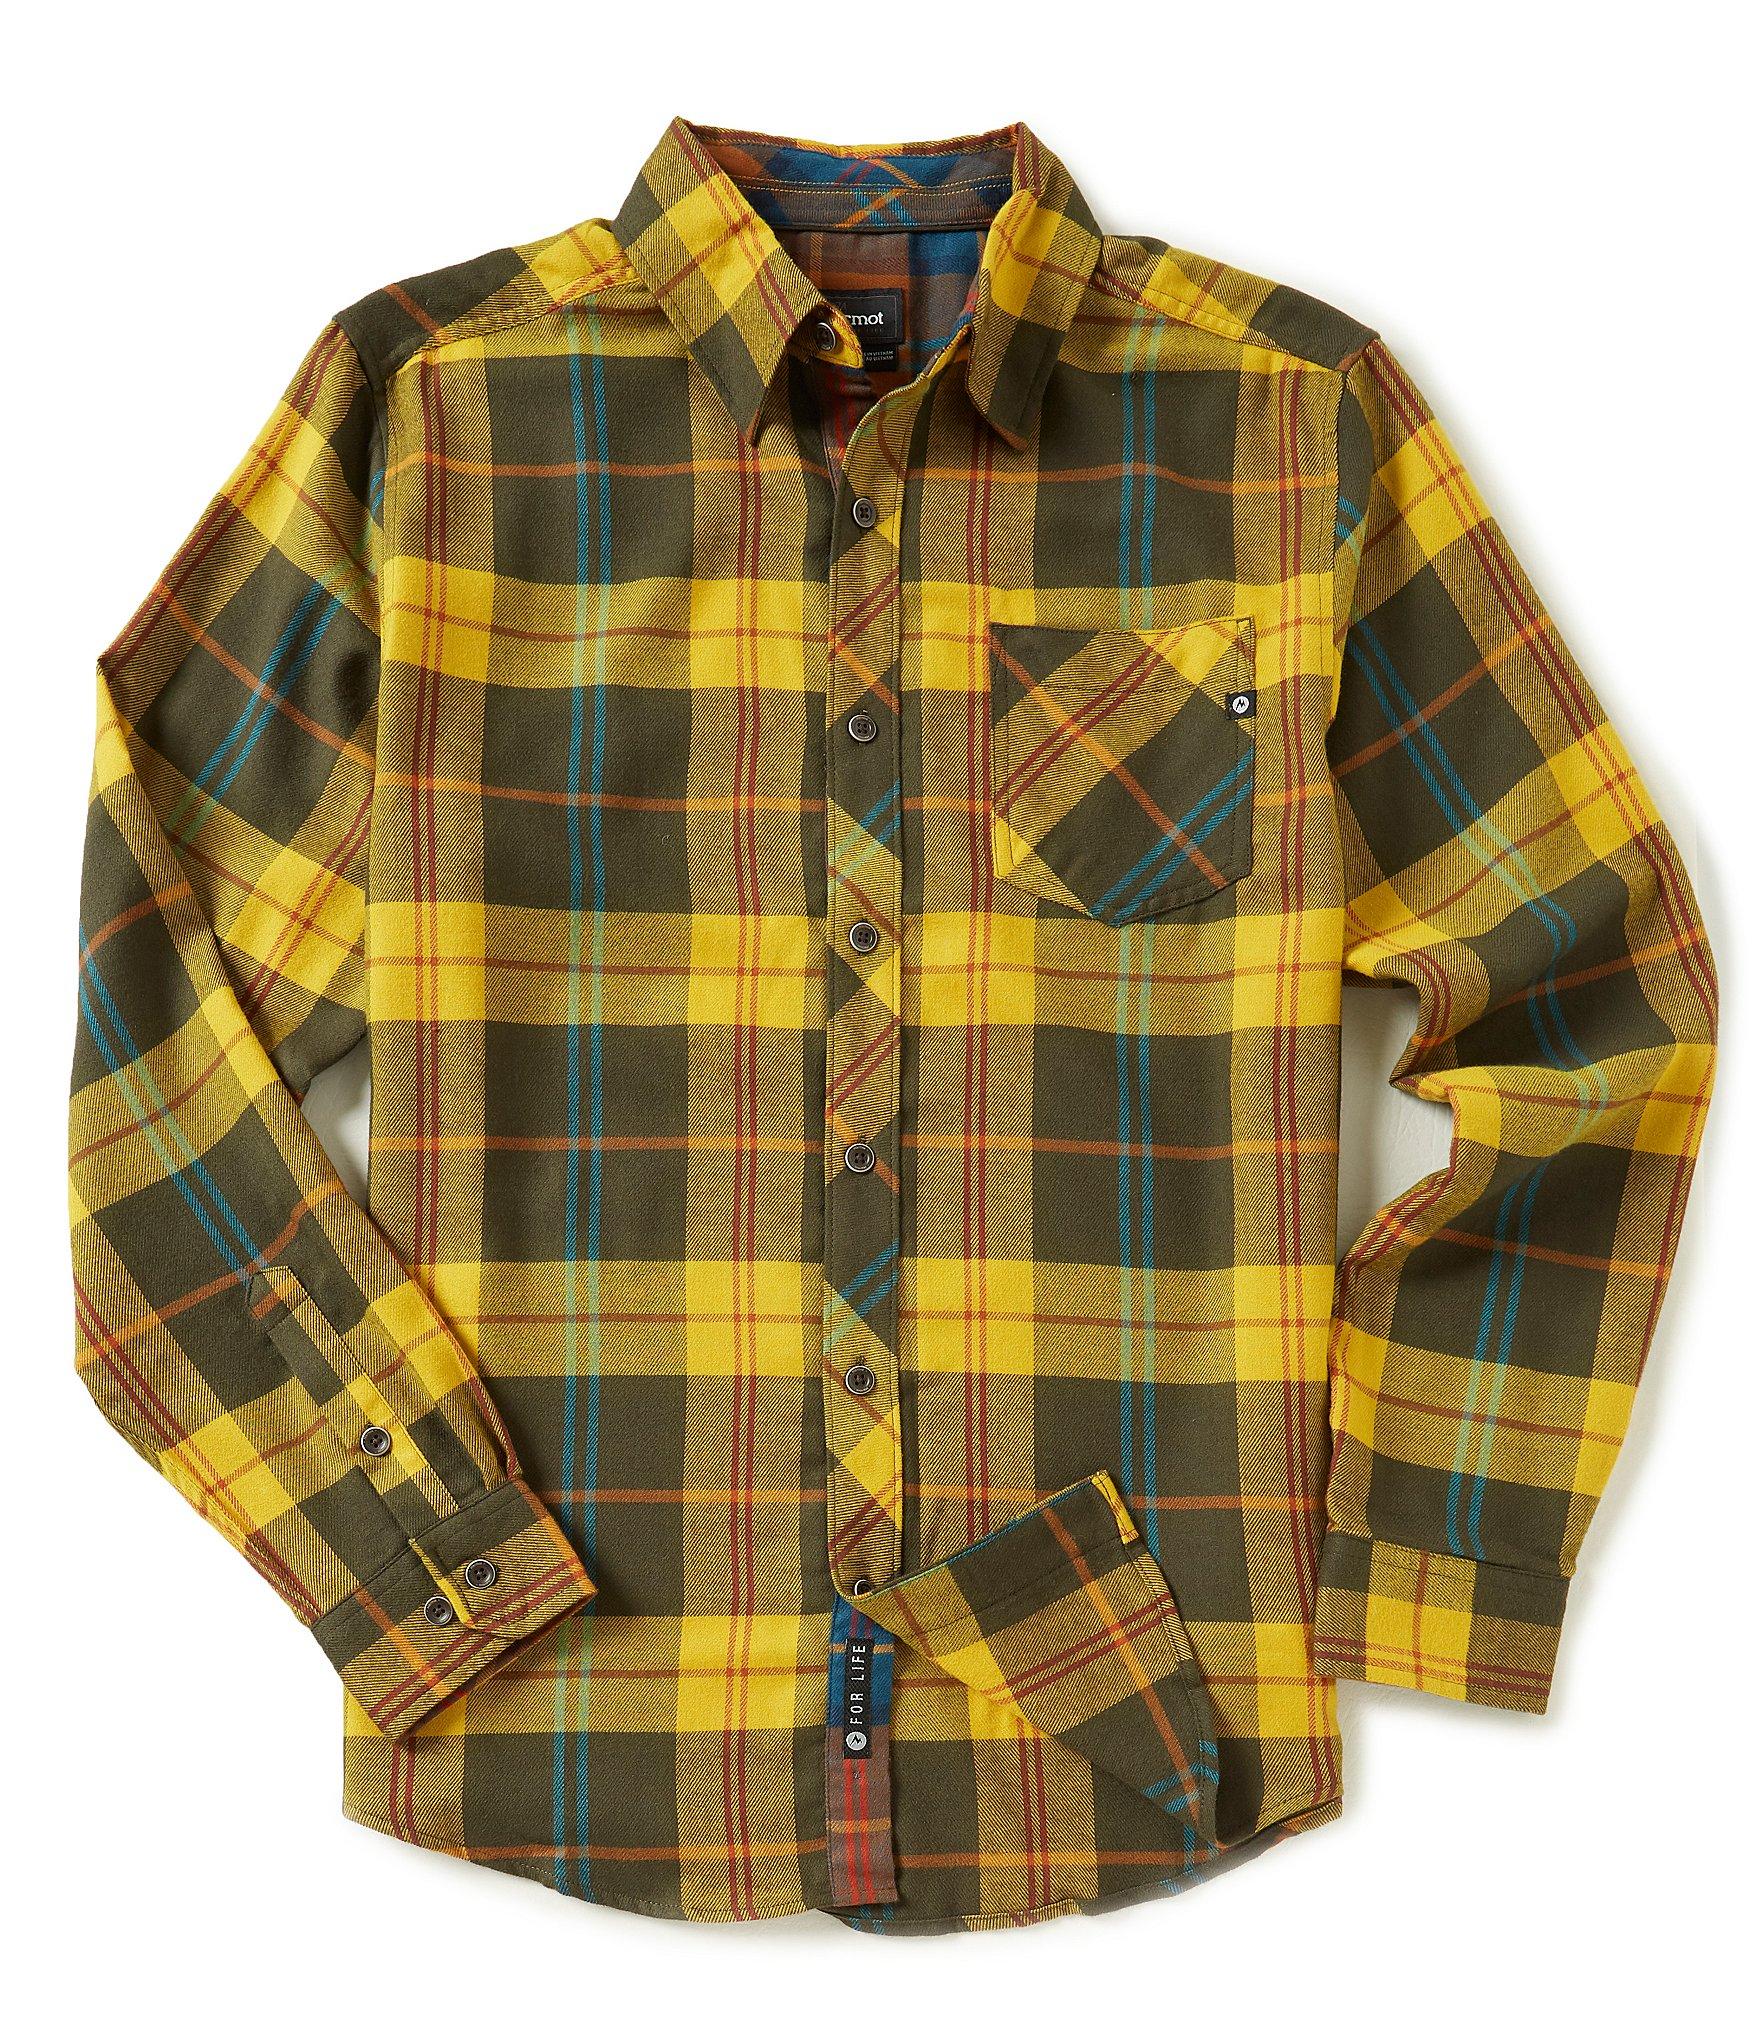 Marmot anderson long sleeve flannel woven shirt dillards for Marmot anderson flannel shirt men s